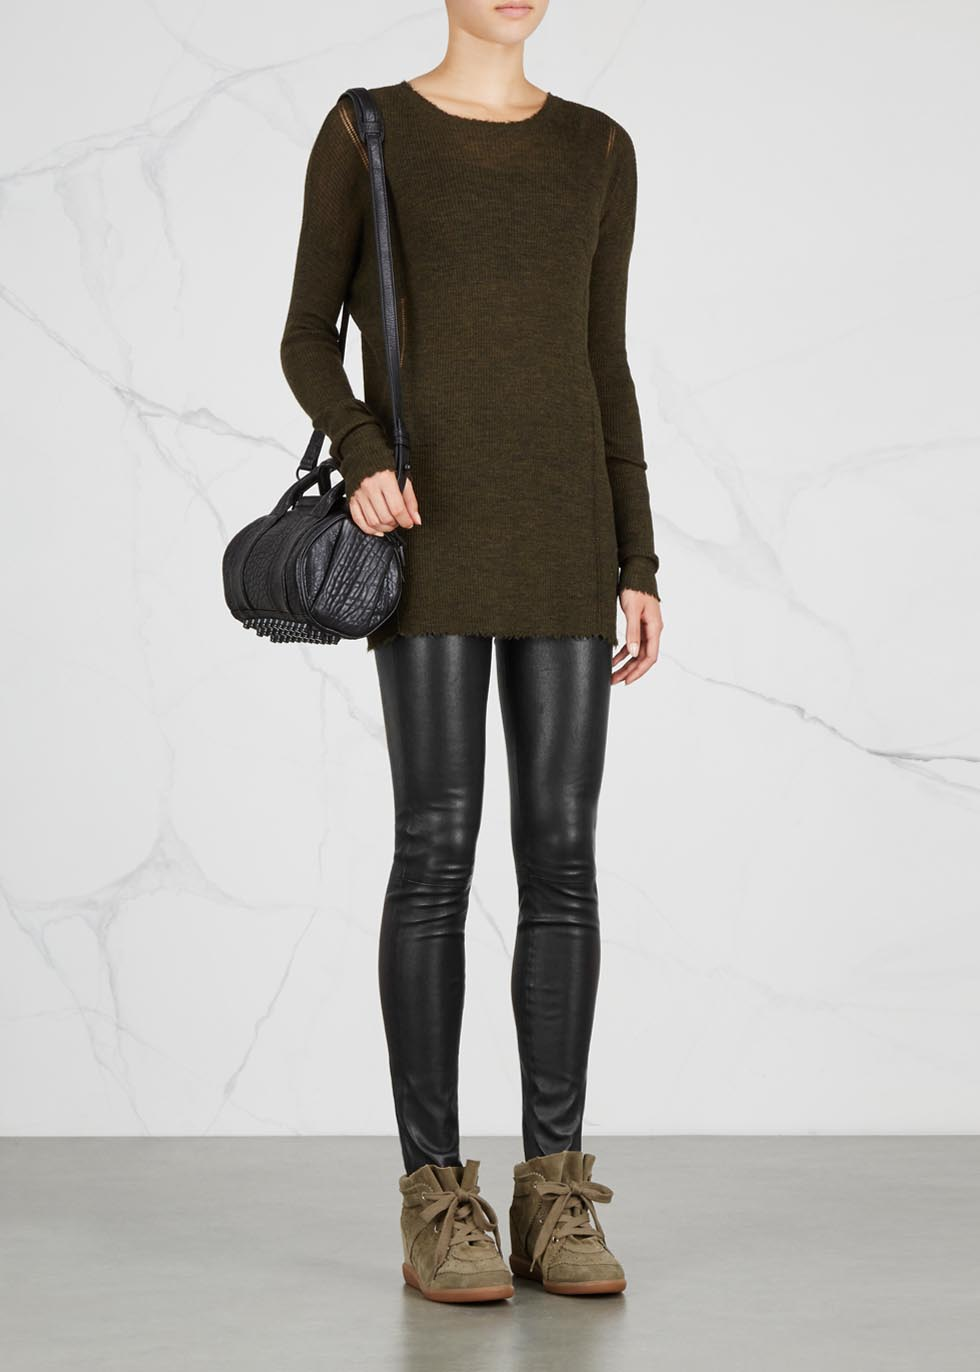 Black leather leggings - Helmut Lang